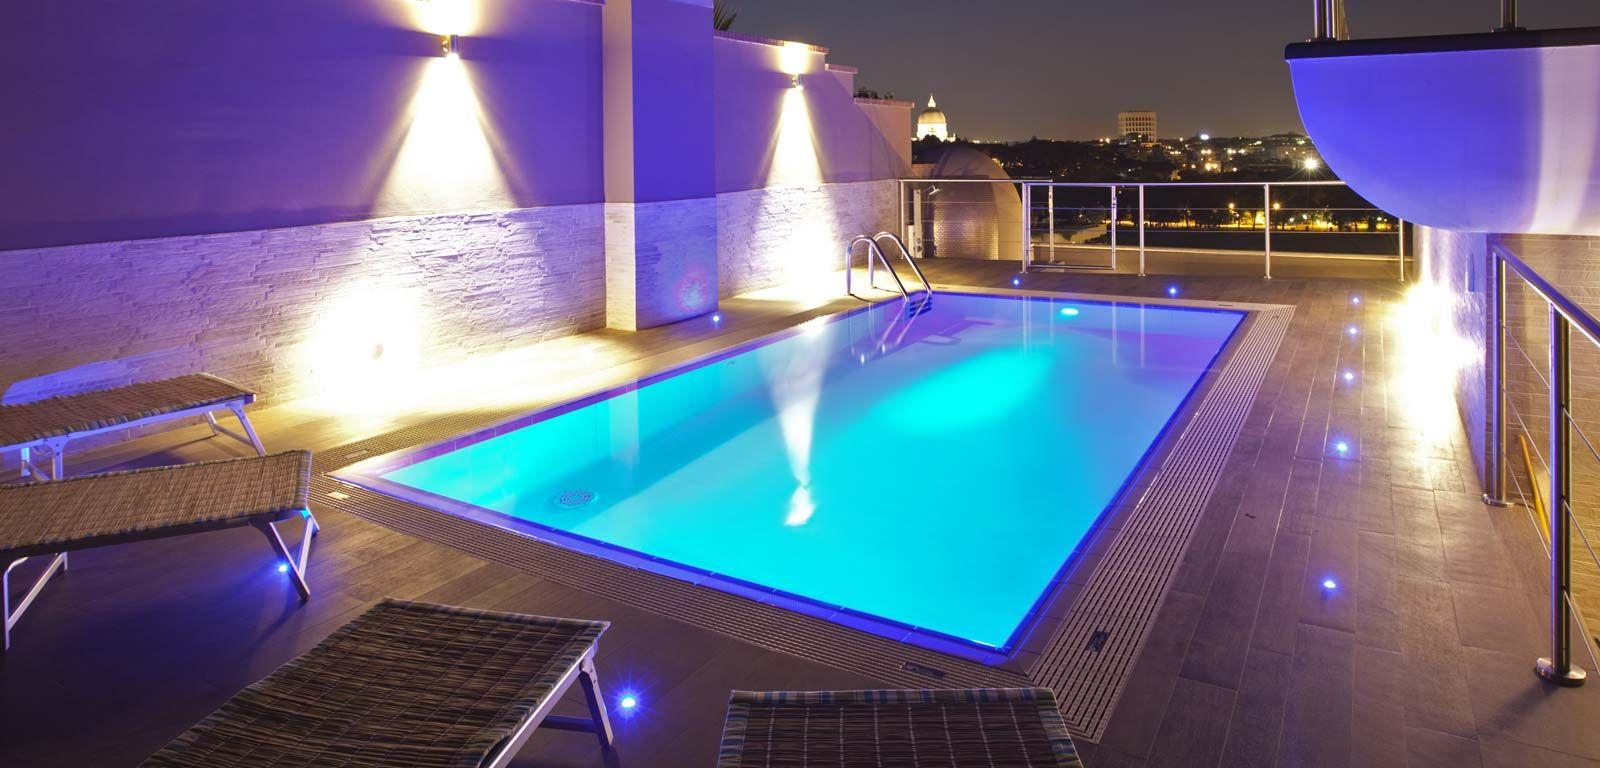 Illuminazione per piscine Piscine, Illuminazione